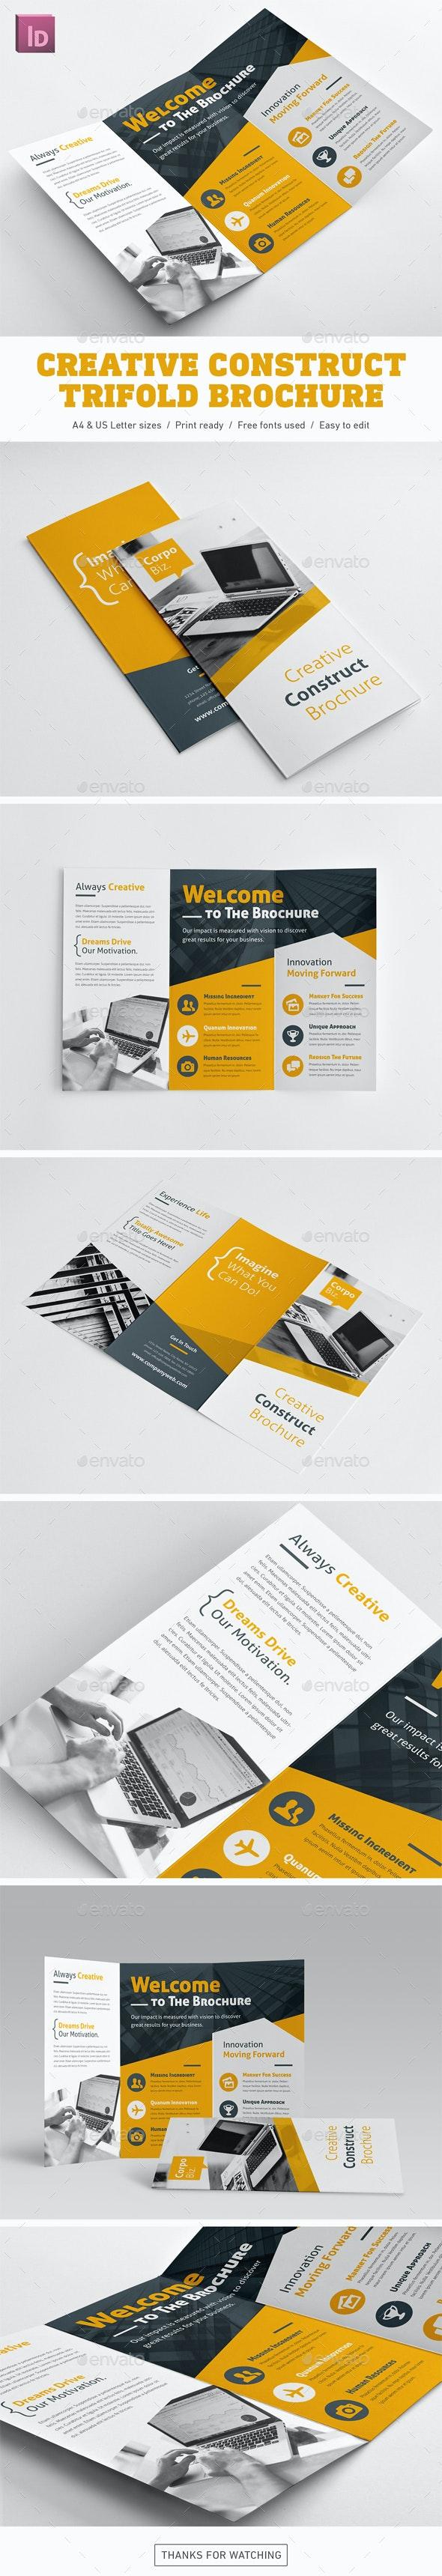 Creative Construct Trifold Brochure - Corporate Brochures